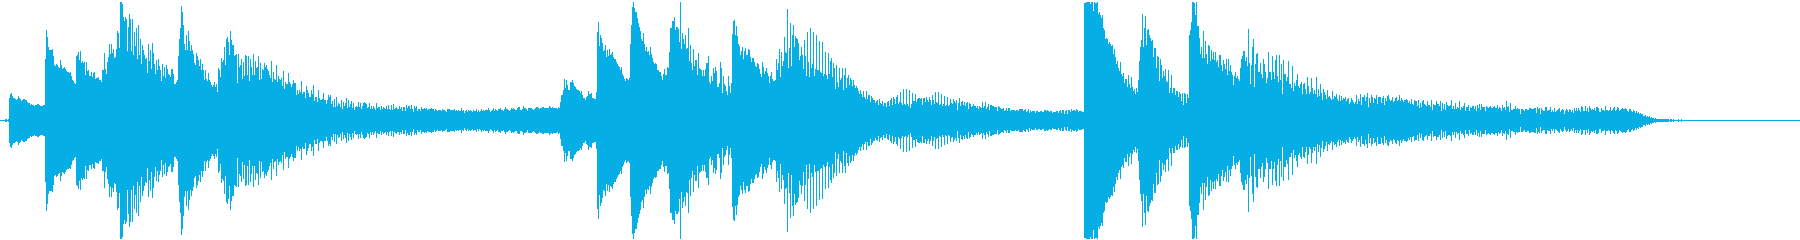 Shinning Moment 3の再生済みの波形